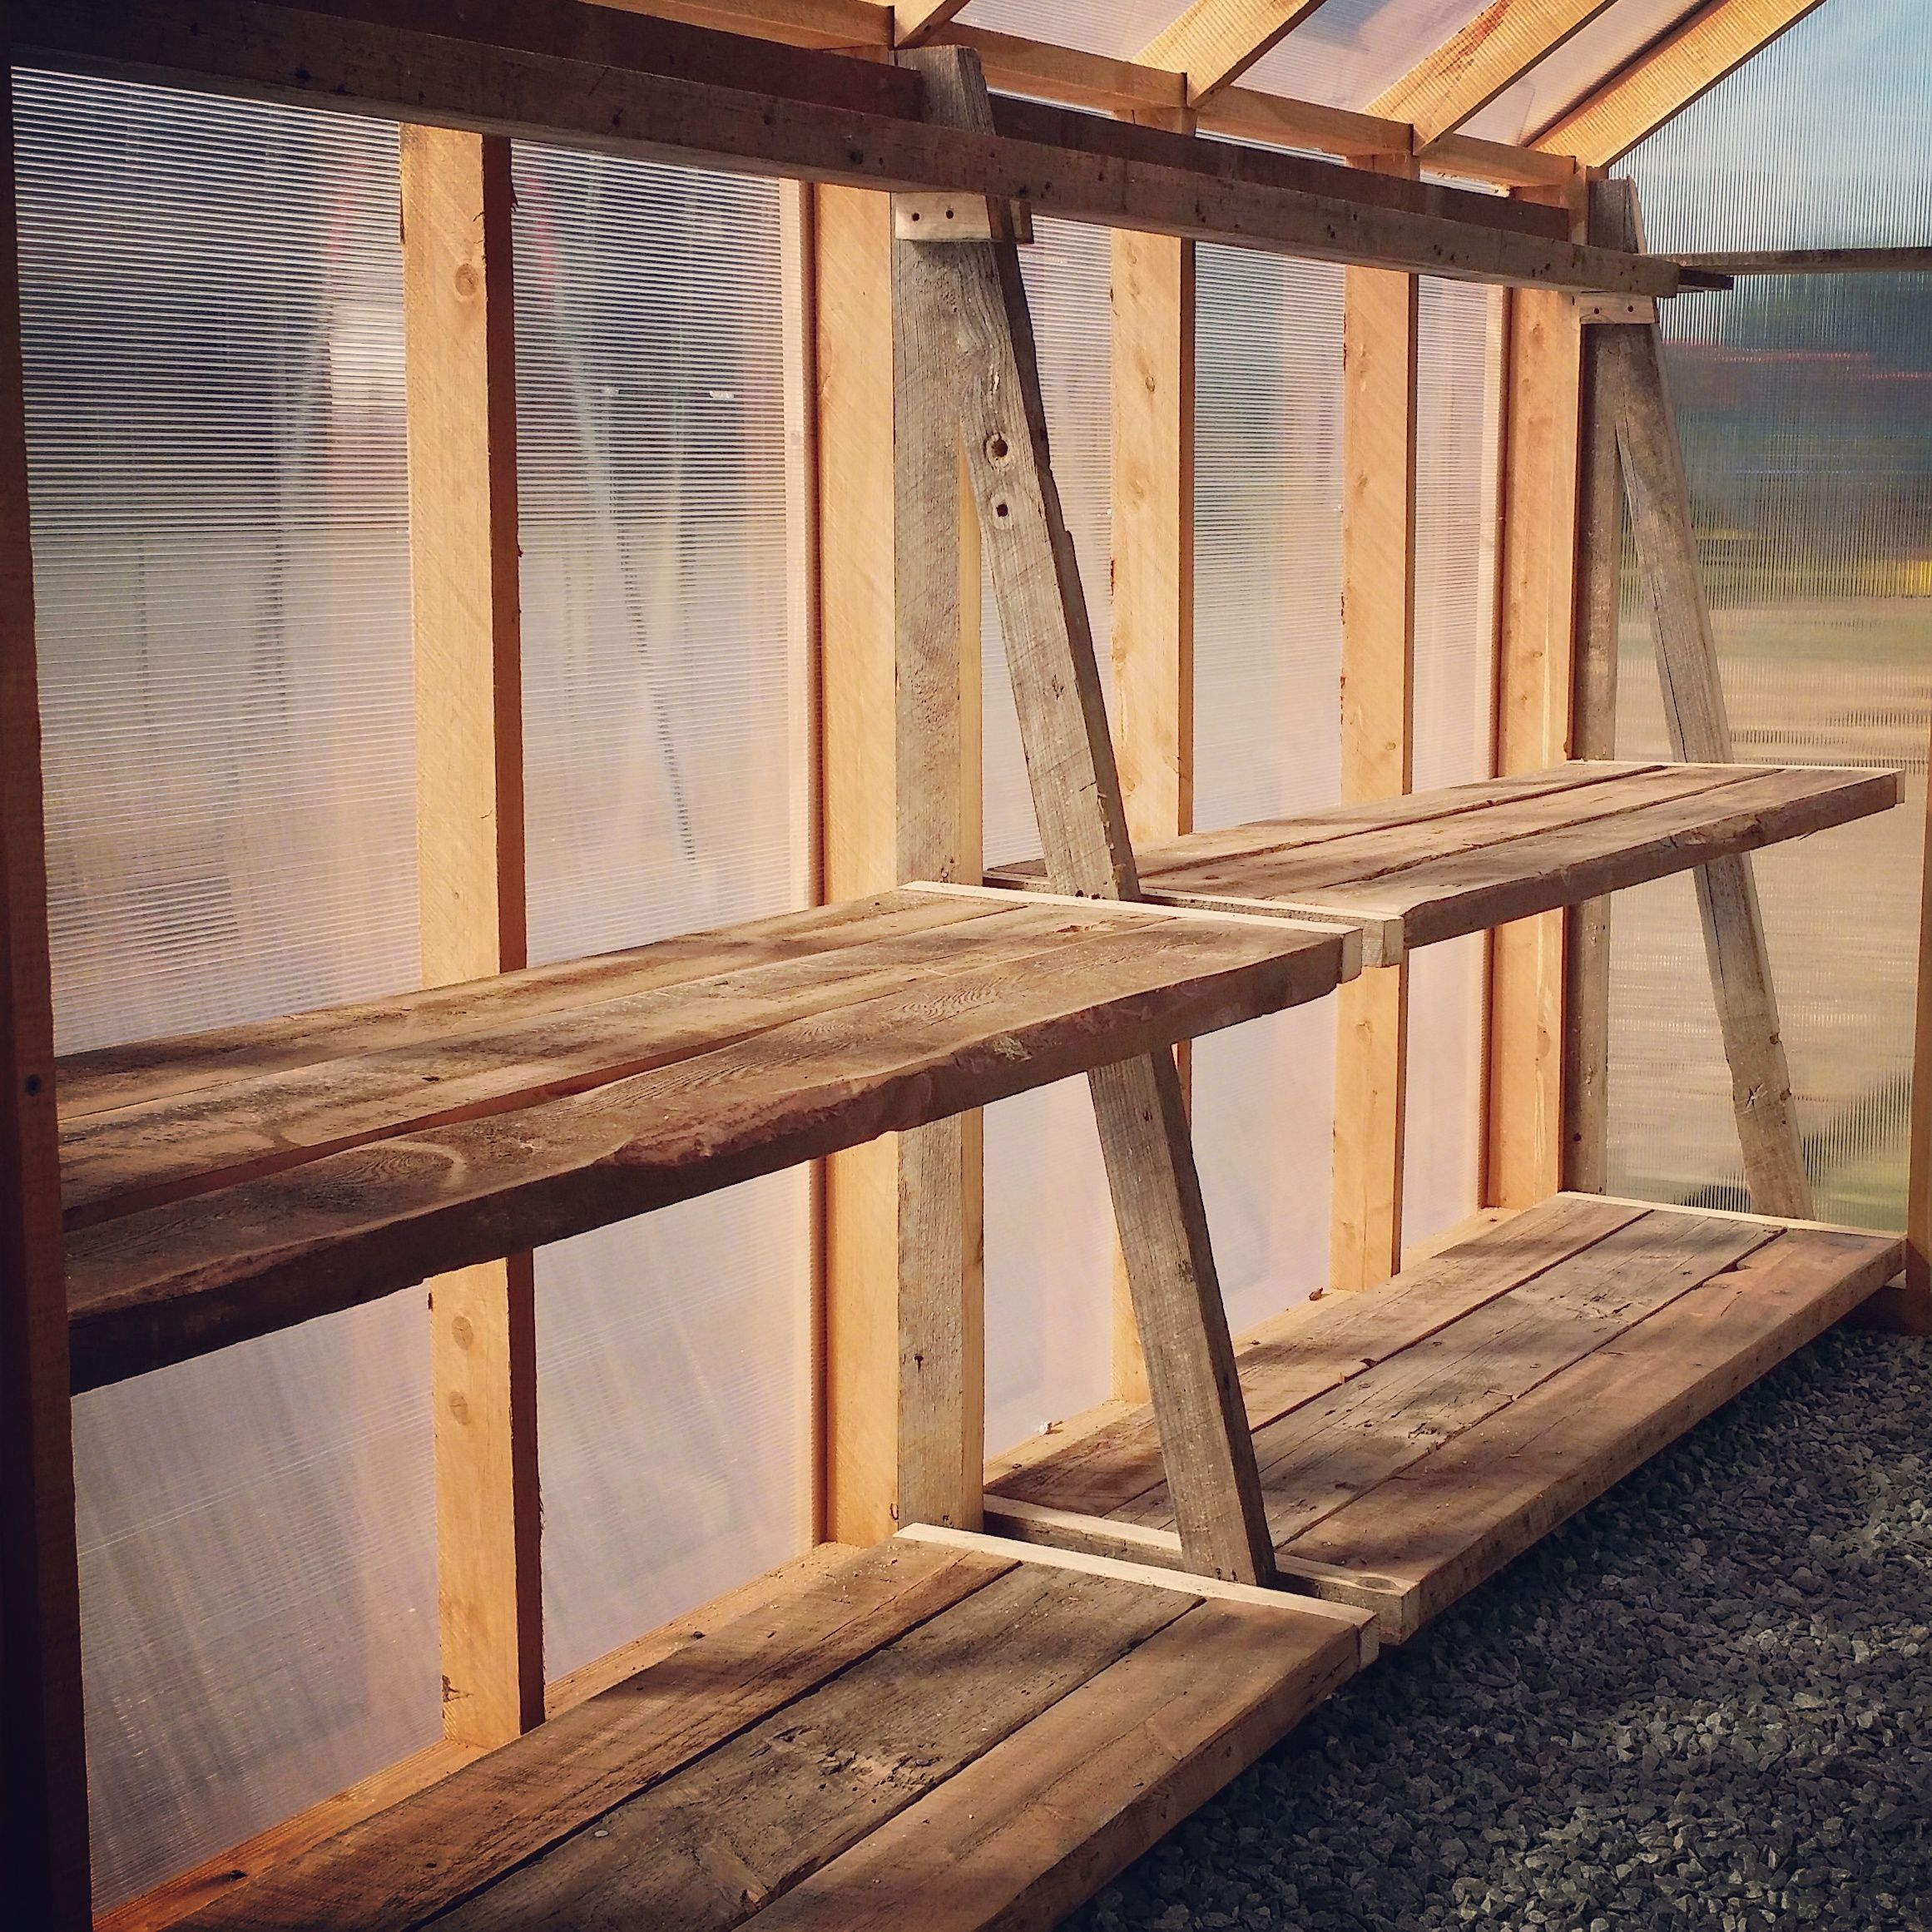 garden furniture for sale in charlotte nc microfarm organic rh pinterest com au plastic shelving for greenhouses plastic shelving for greenhouses